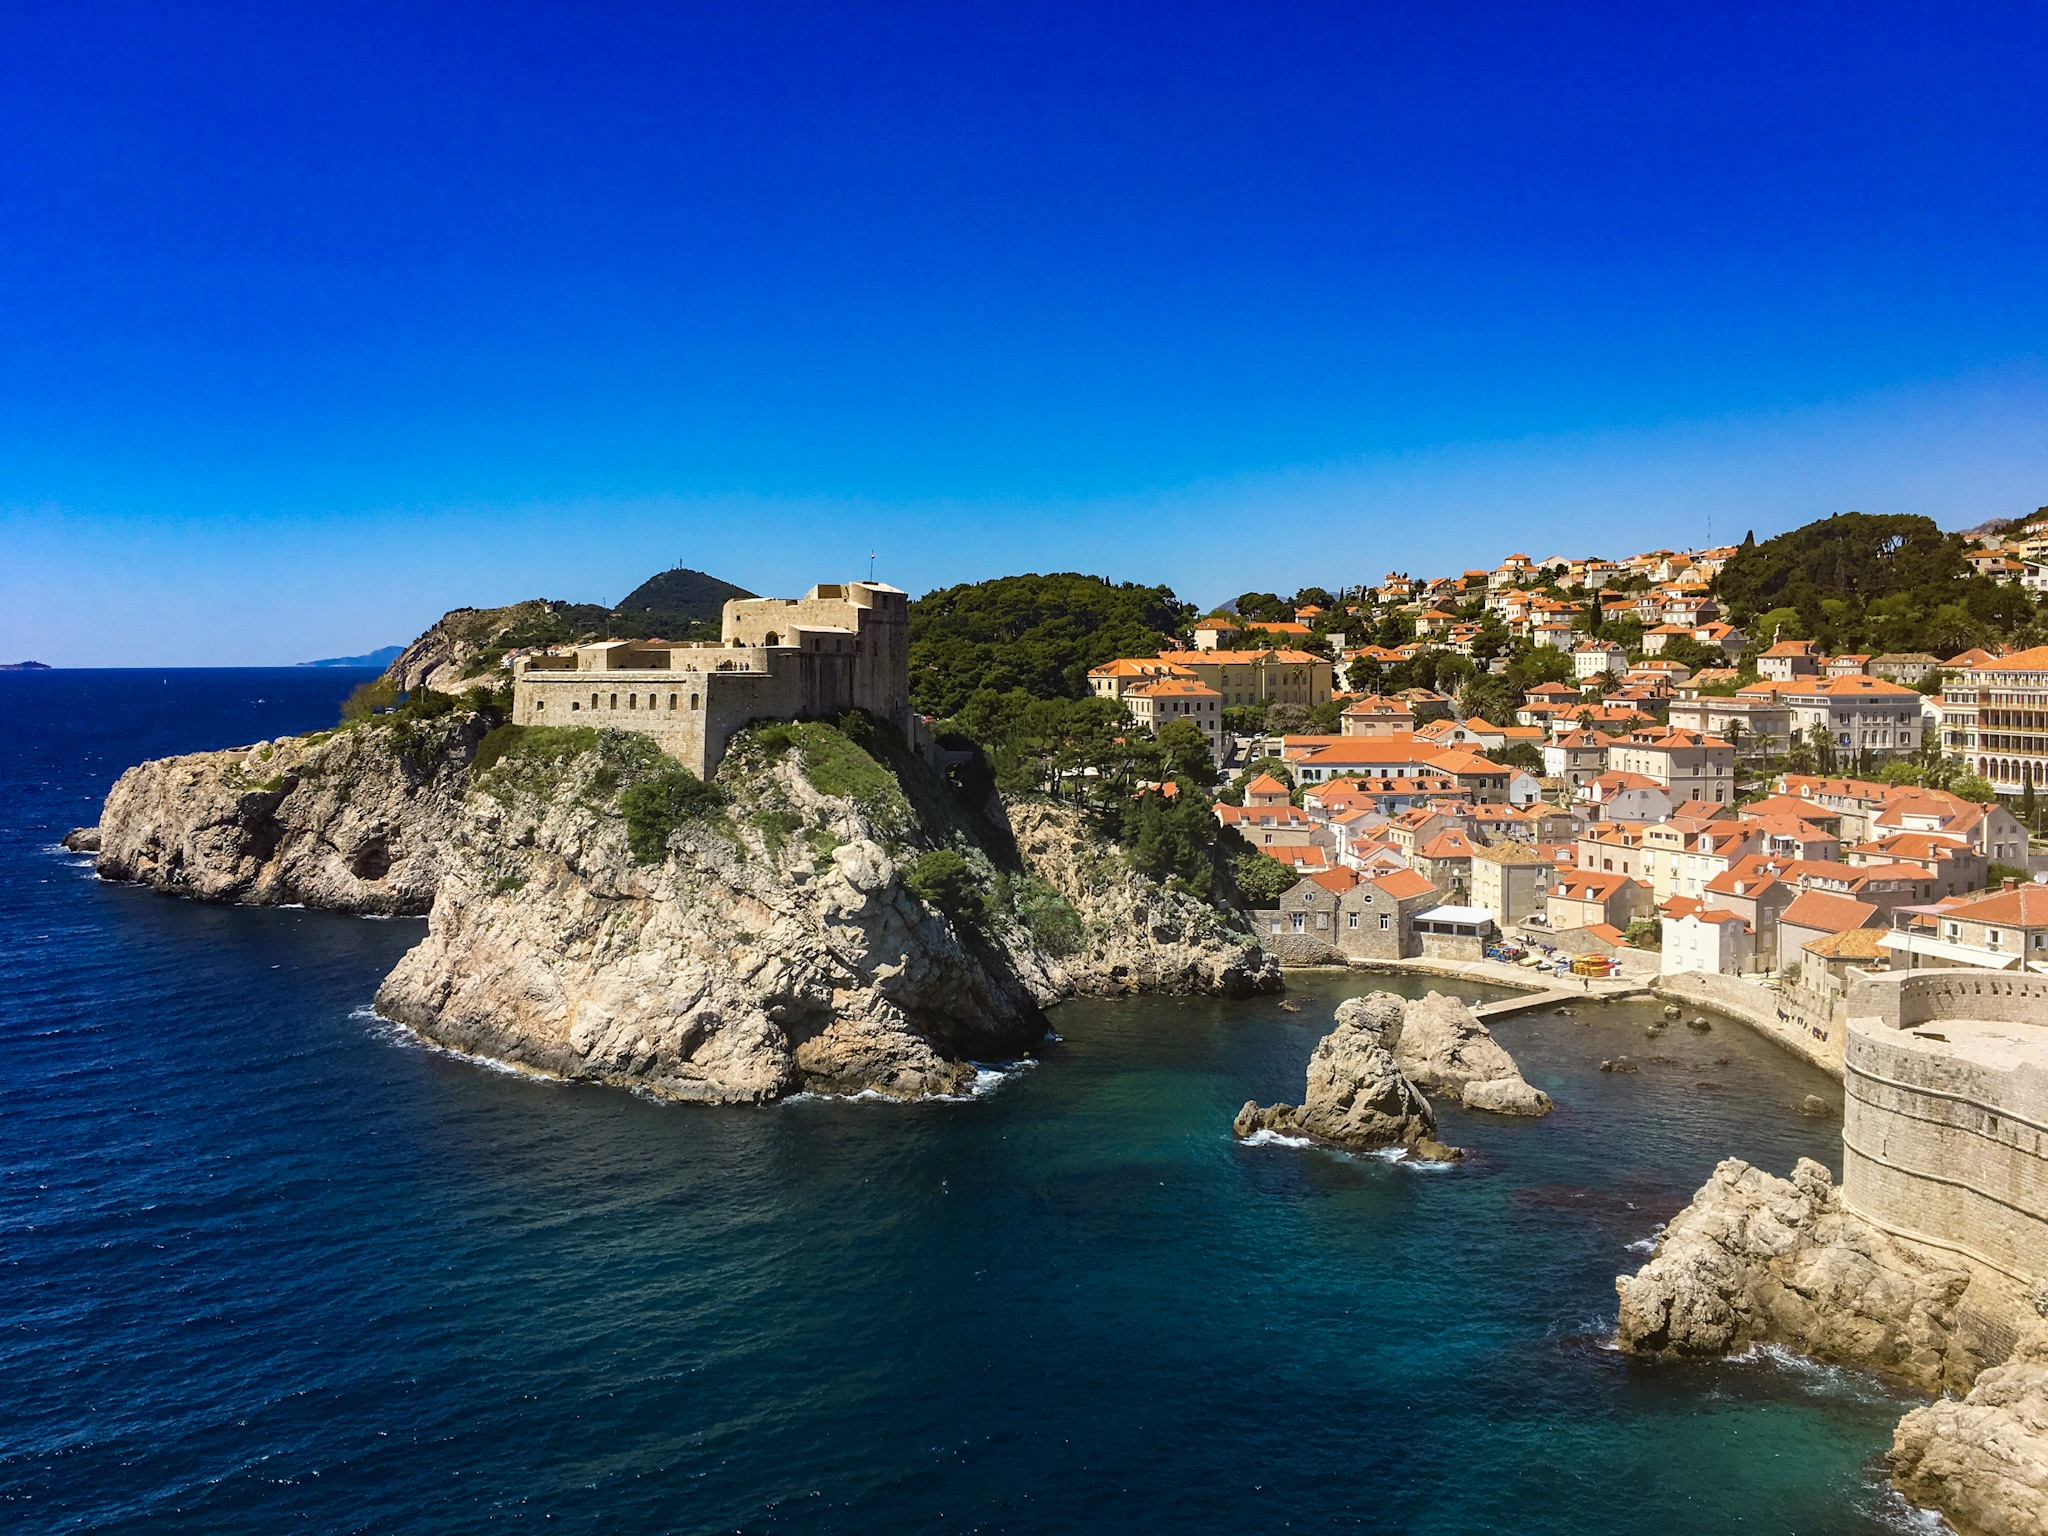 8. Dubrovnik Coastline